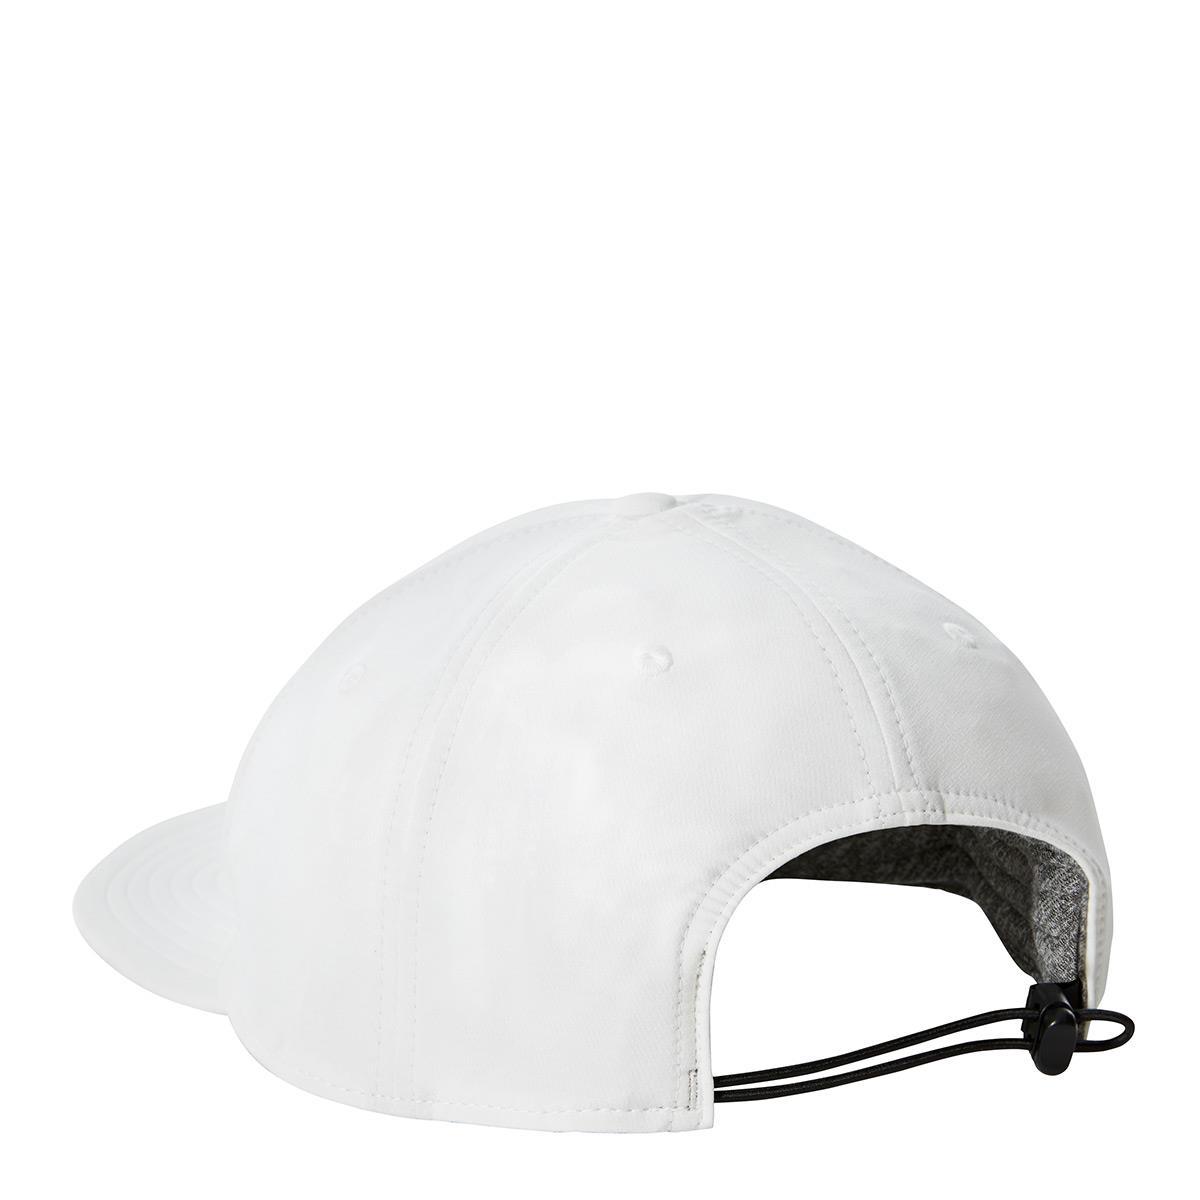 The North Face  TECH NOR  Şapka  Unisex NF0A3FKHFN41